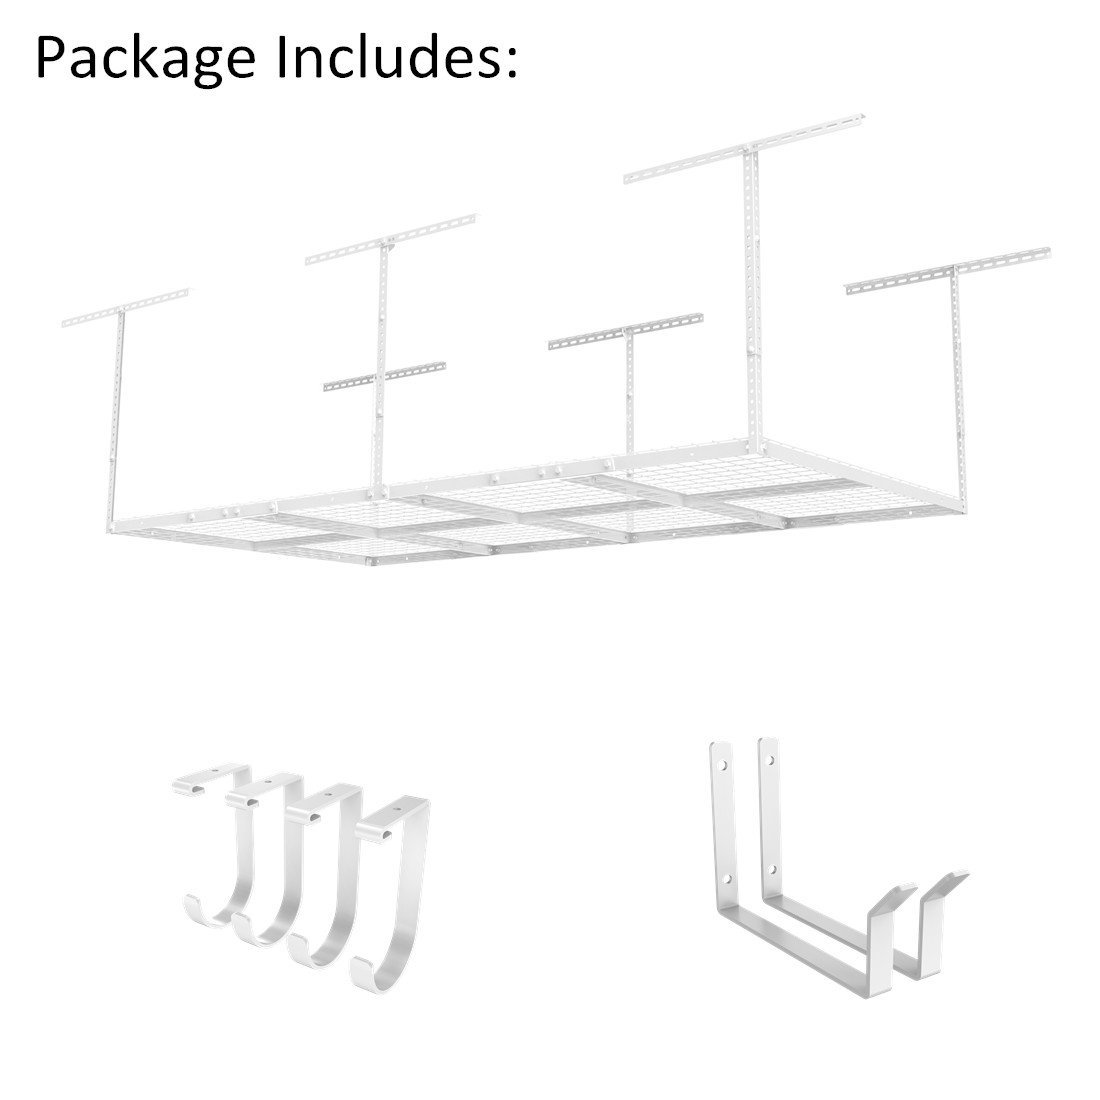 "Fleximounts 4x8 Overhead Garage Rack with Add-on Hooks Set Heavy Duty Height Adjustable Ceiling Racks (22-40"" Ceiling Dropdown), White"